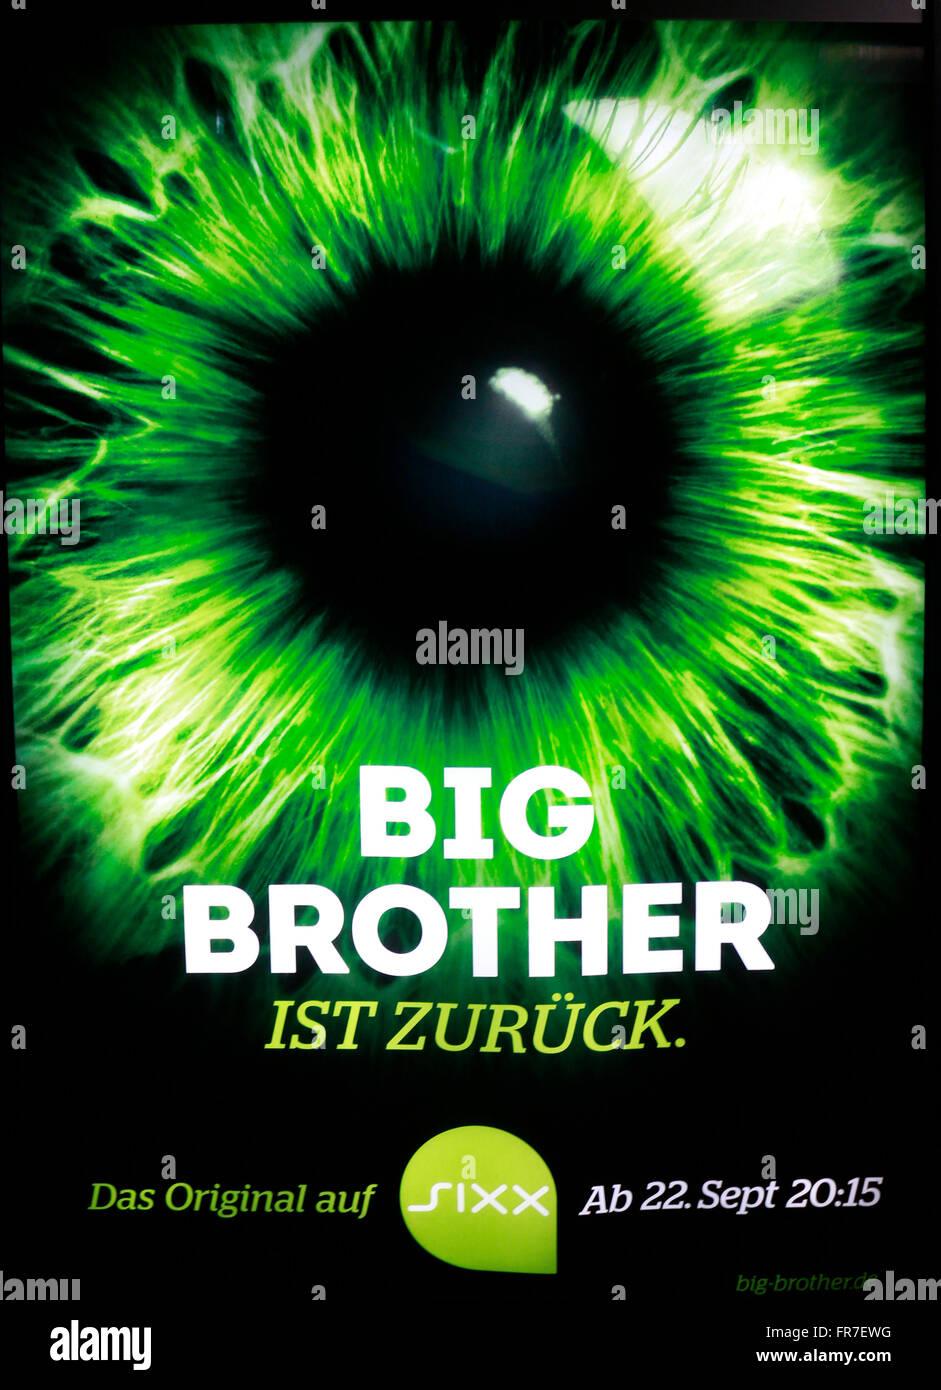 das Logo der Marke 'Big Brother' (sixx), Berlin. - Stock Image